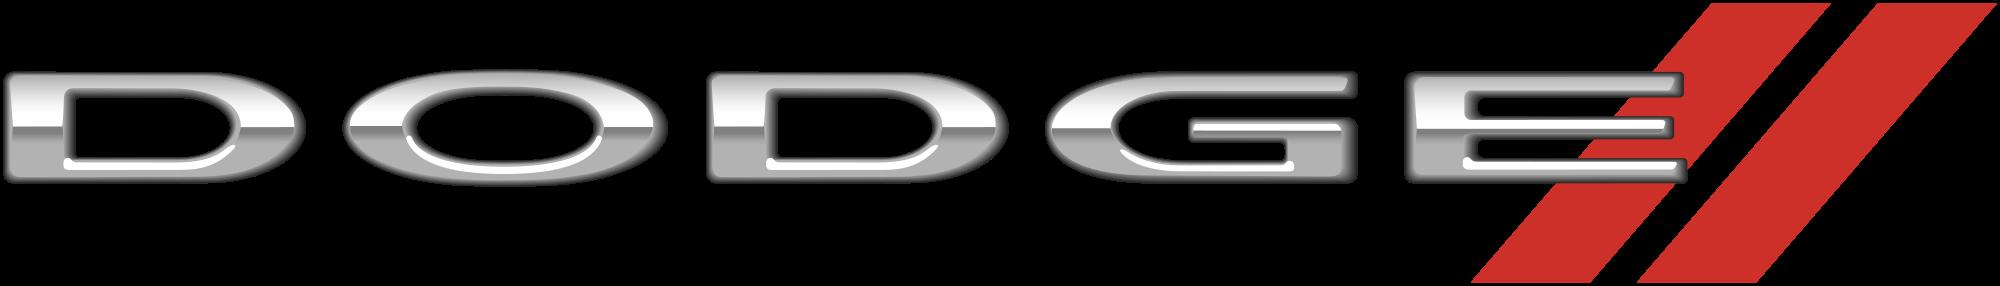 додж логотип: